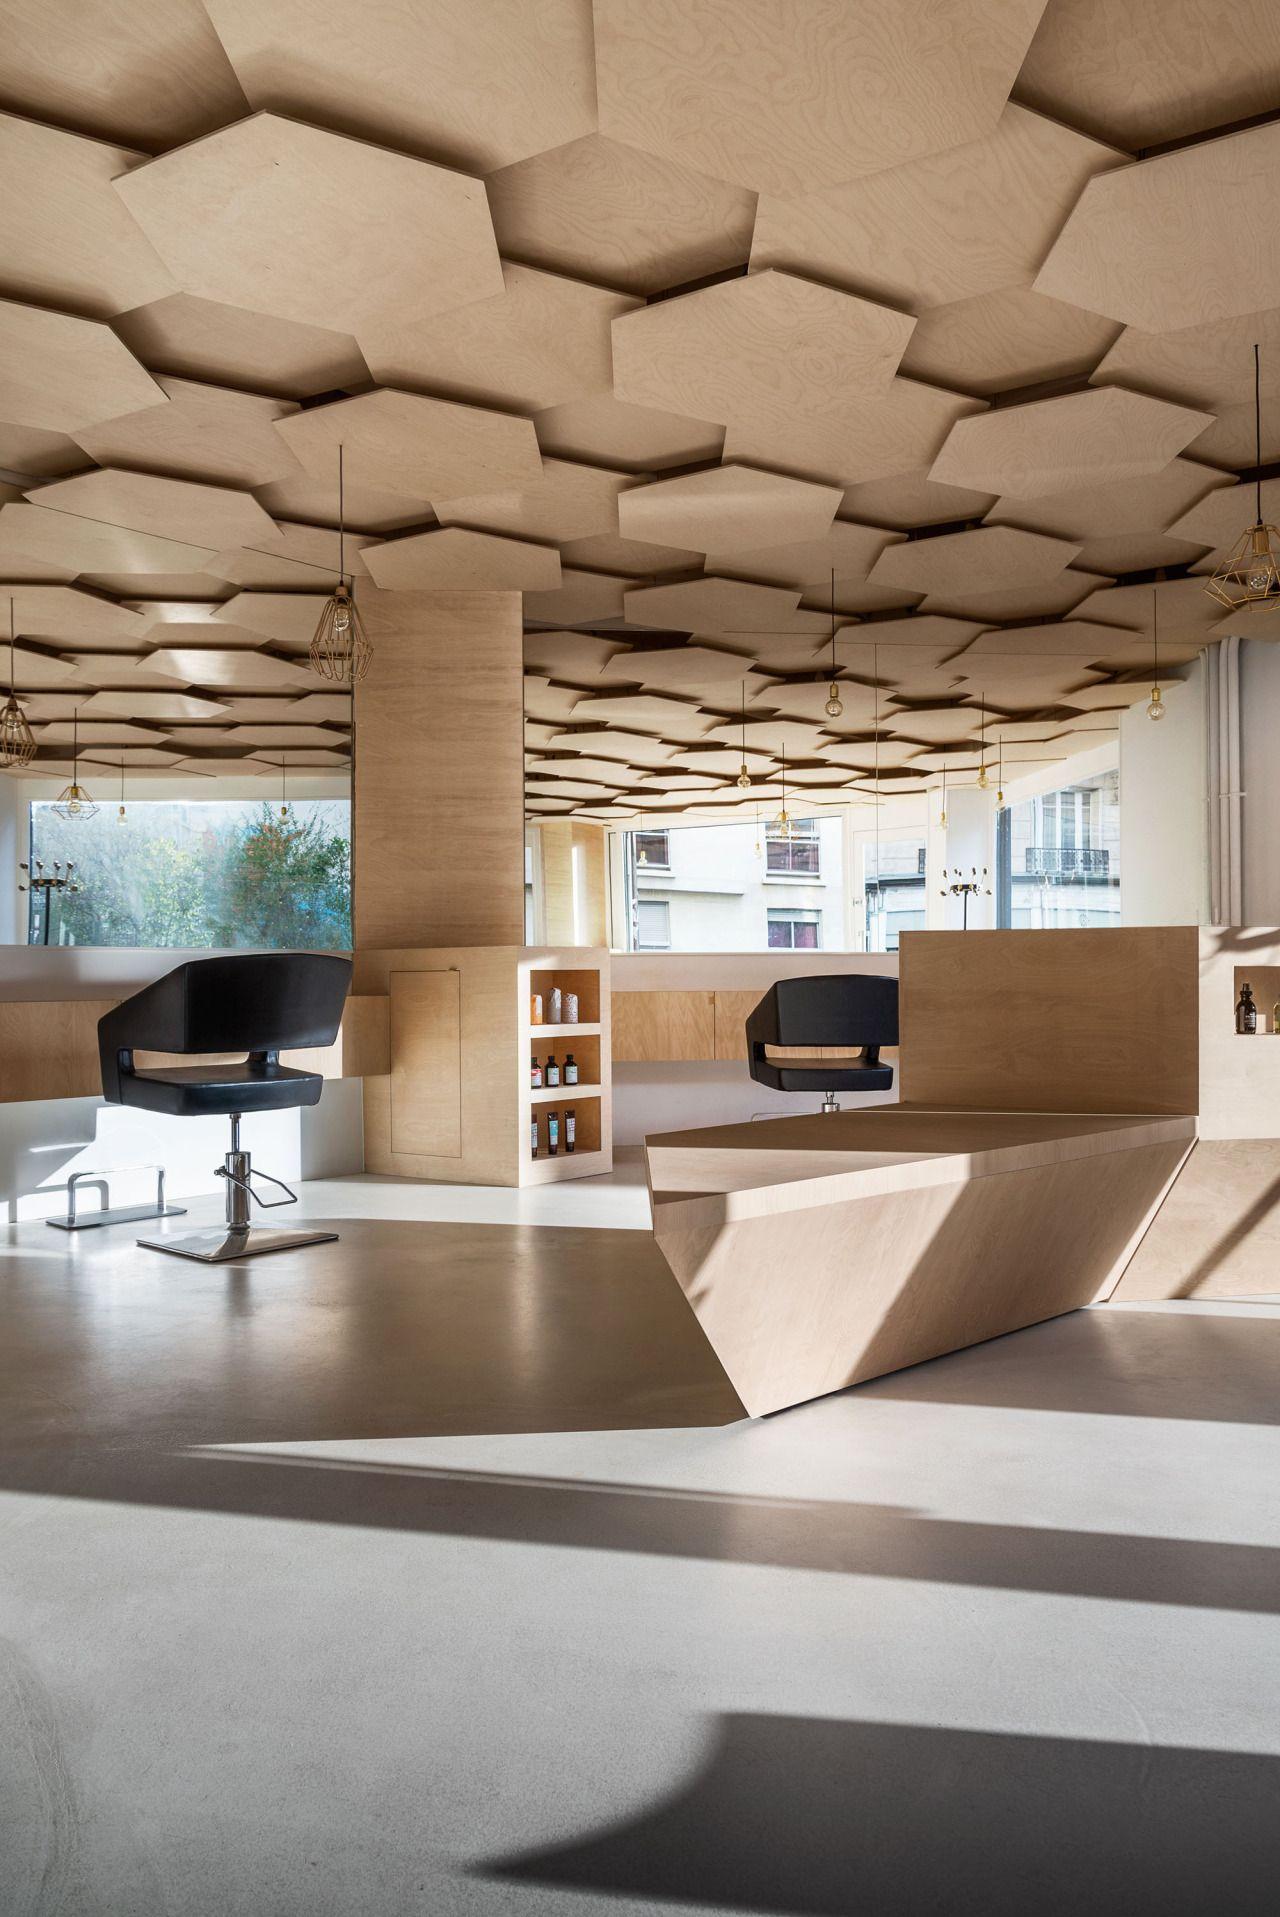 Dezeen Hexagonal Patterned Ceiling Added To Paris Hair